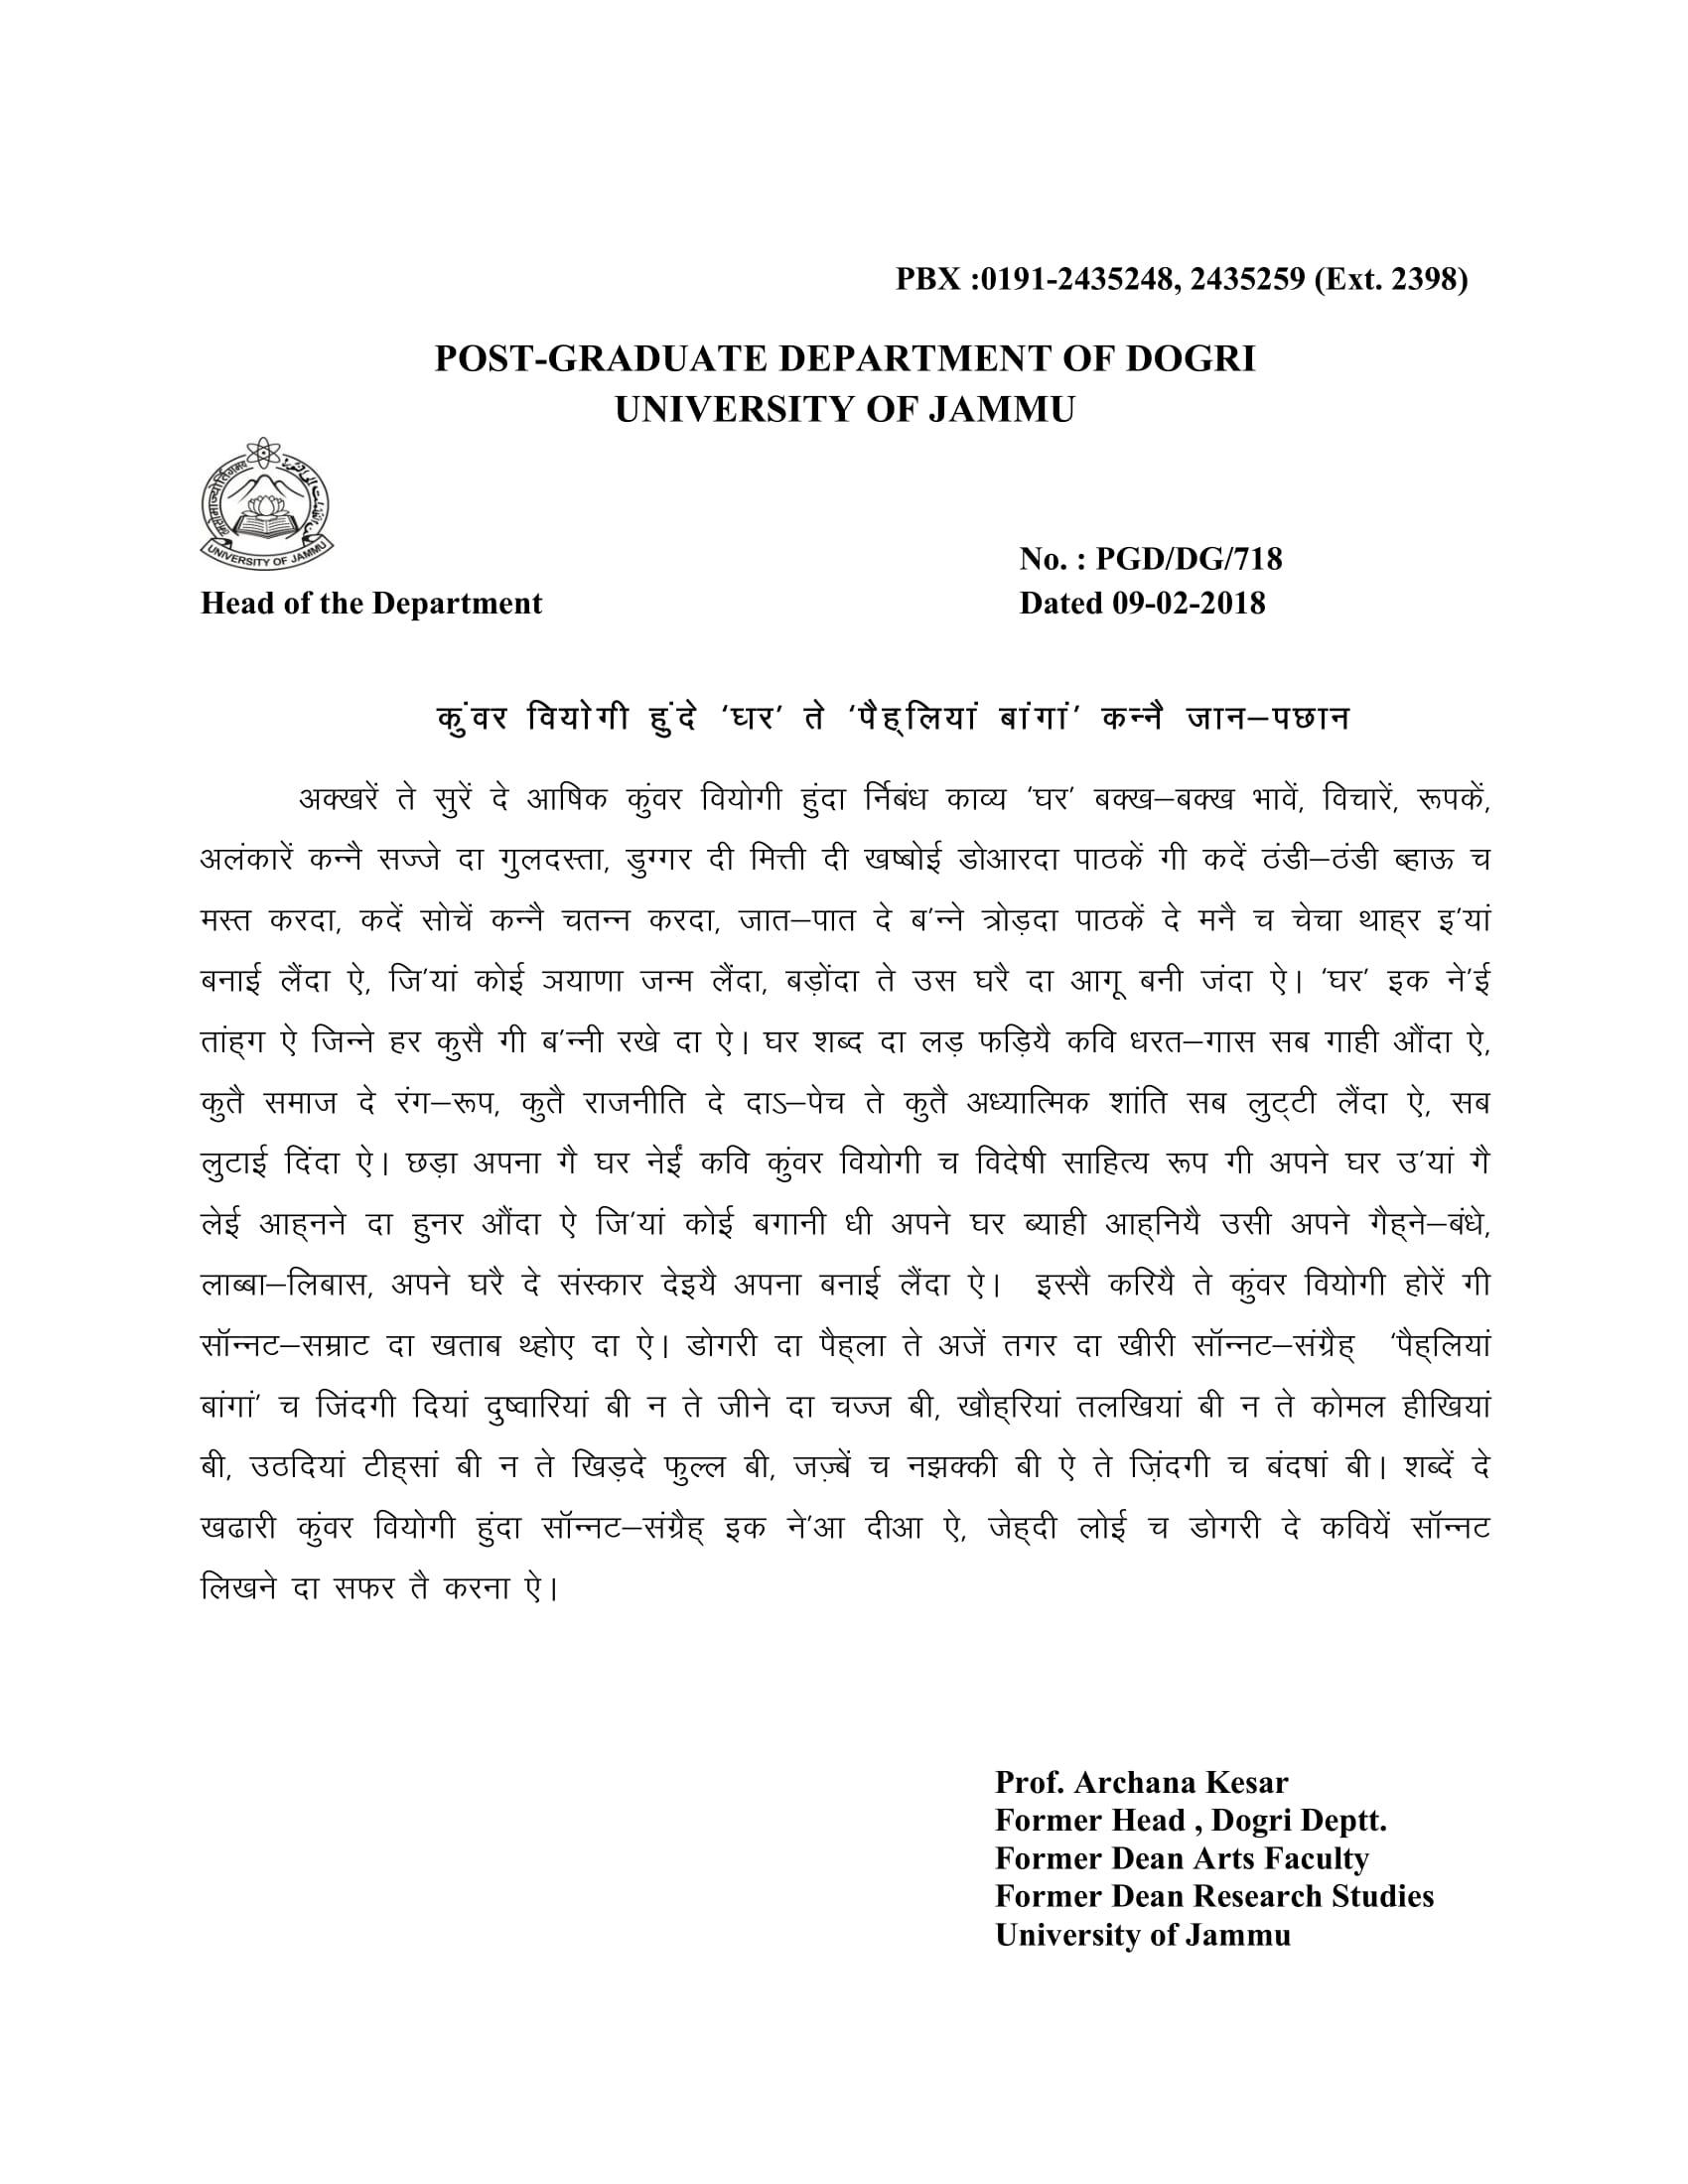 Testimonial by Prof. Archana Kesar, Former Head , Dogri Deptt., University of Jammu